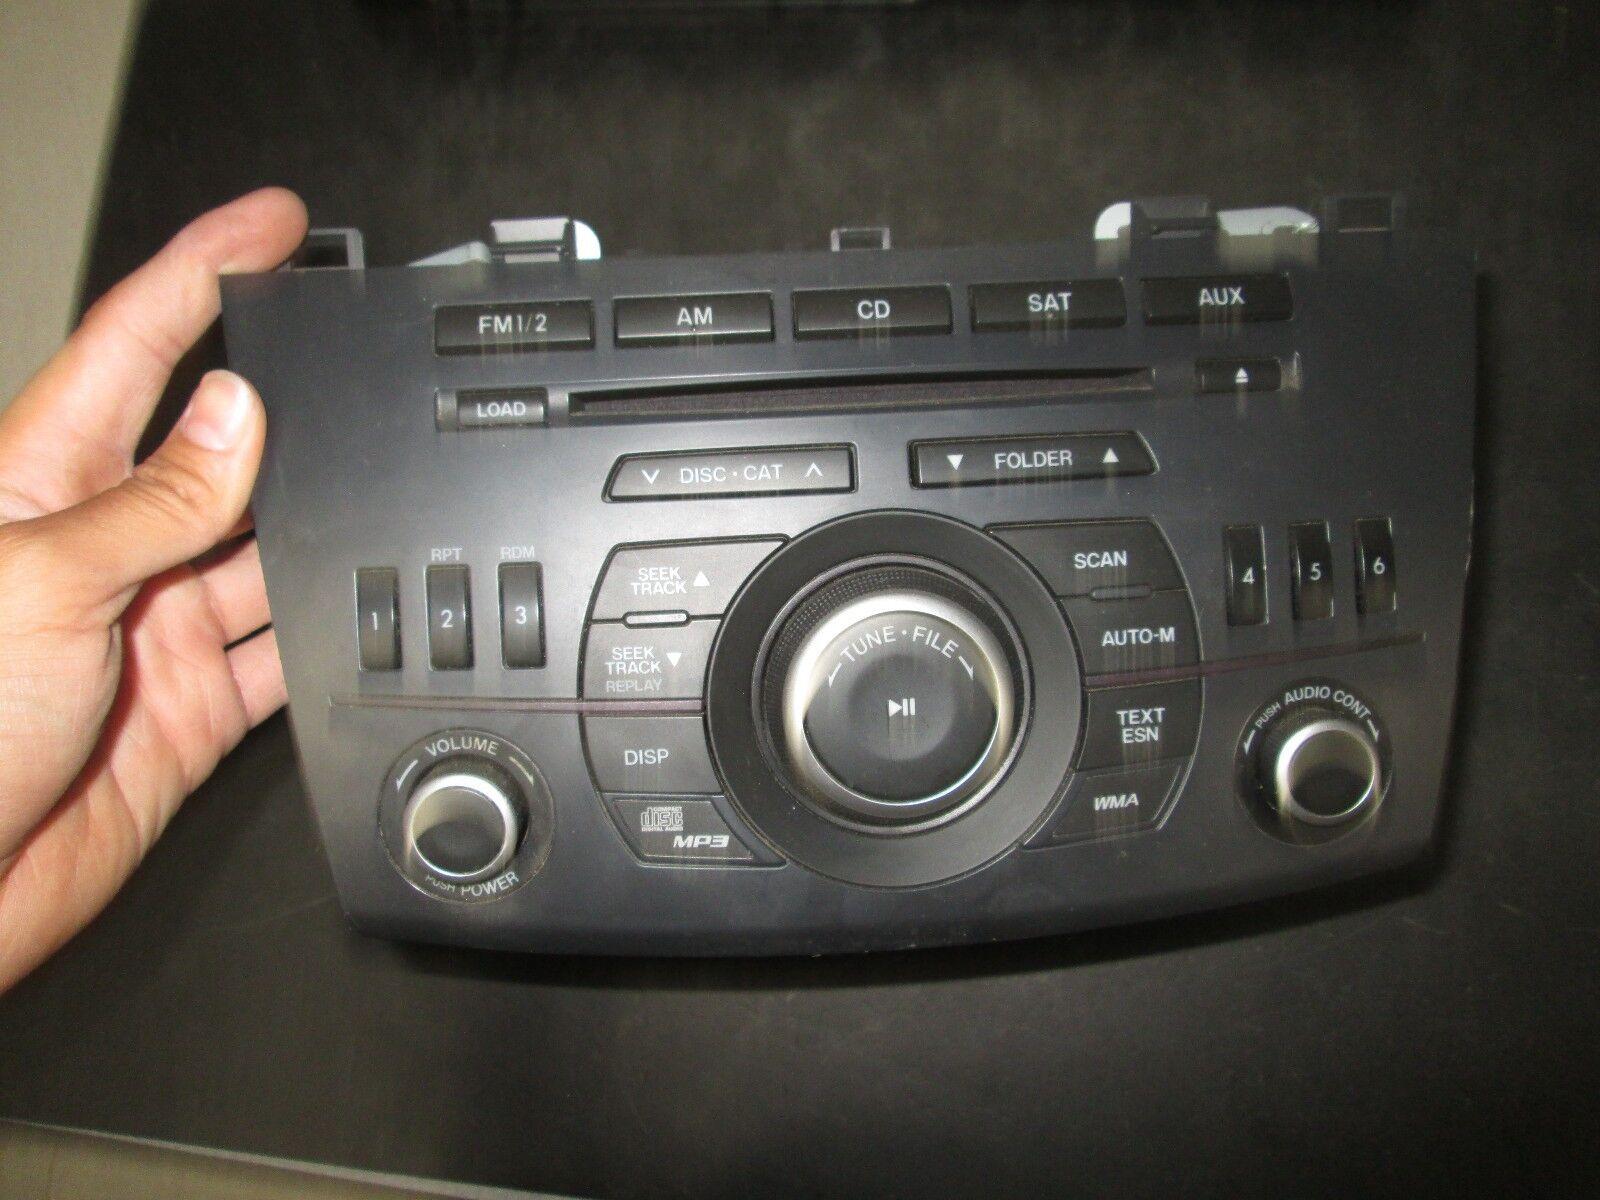 11 12 13 MAZDA 3 RADIO CD PLAYER OEM #14792746,BBM5-66-AR0